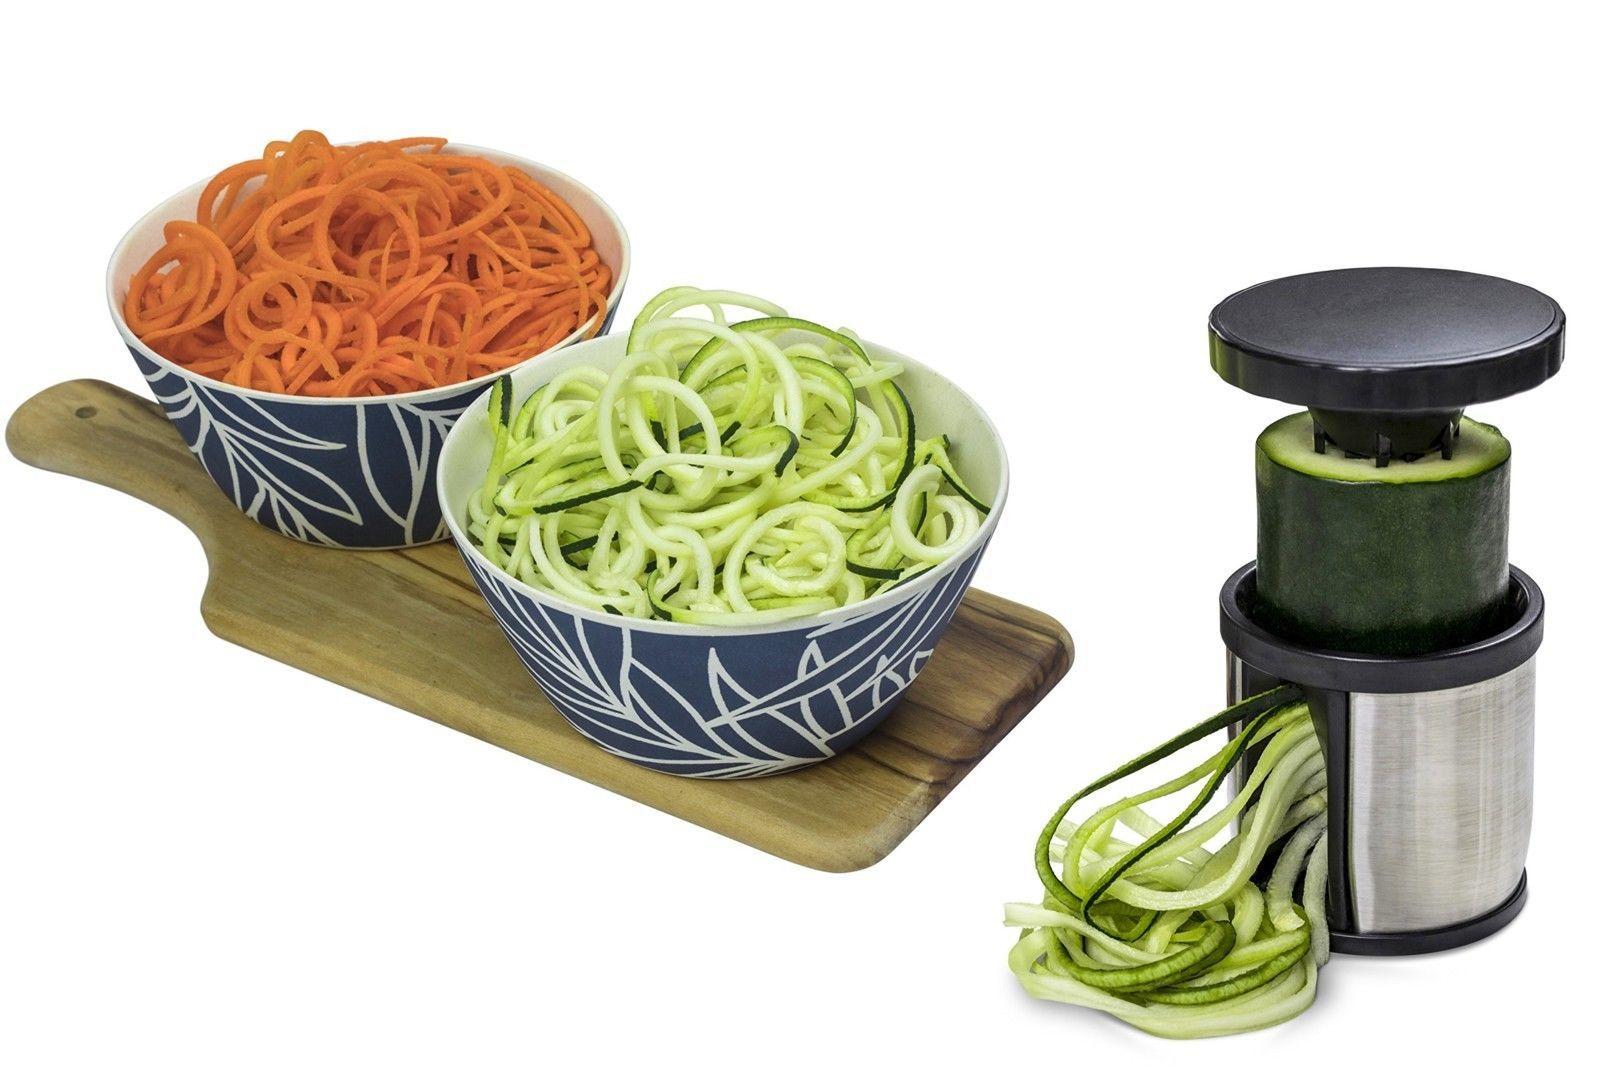 Hand Held Spiralizer Vegetable Slicer Veggie Spiral Cutter Free Recipes PDF NEW